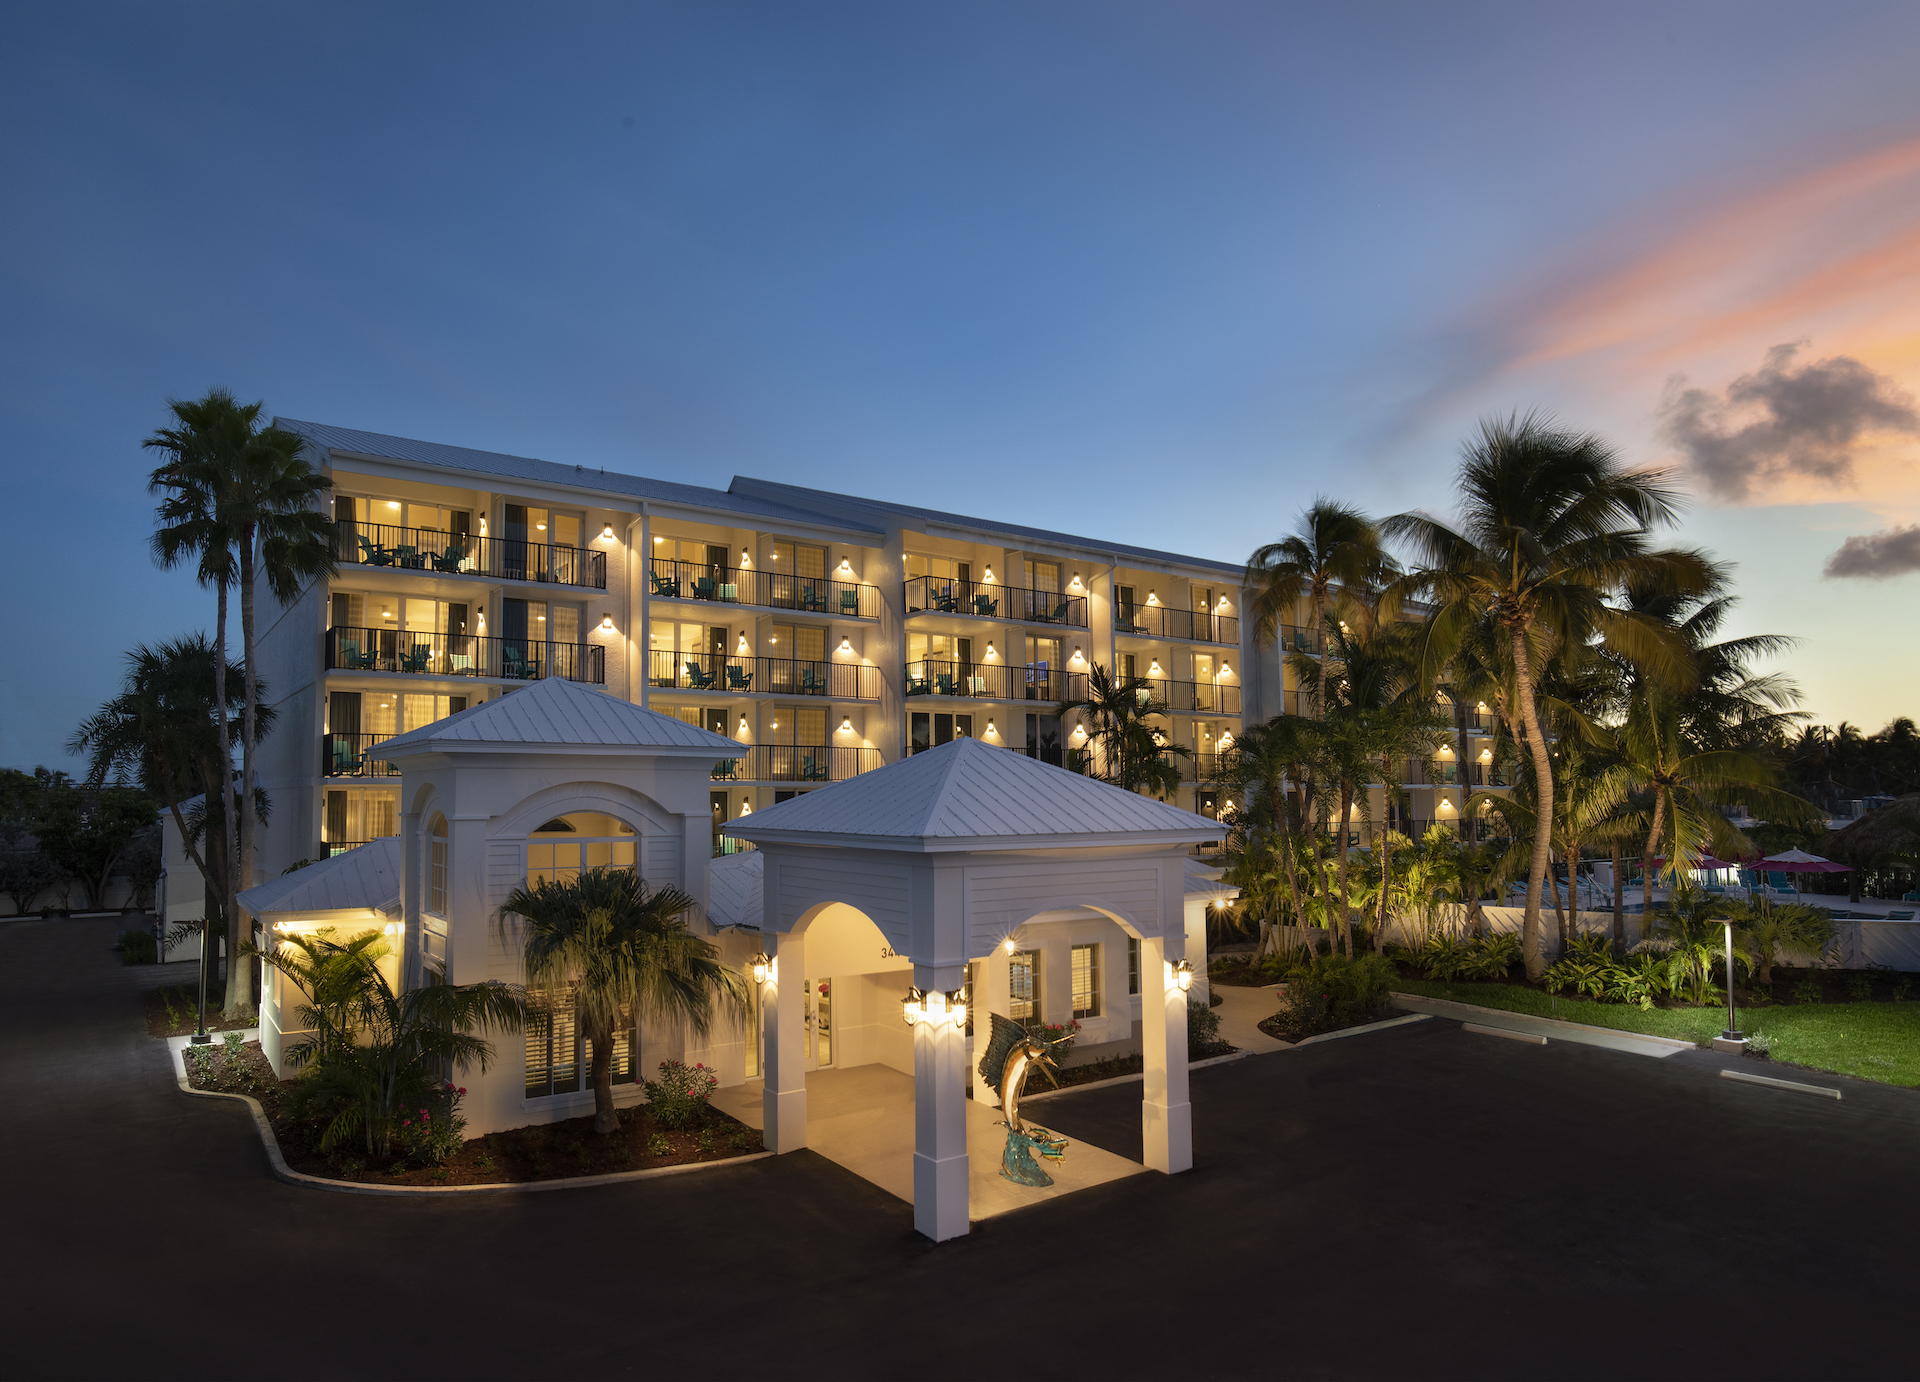 The Laureate Key West exterior evening image